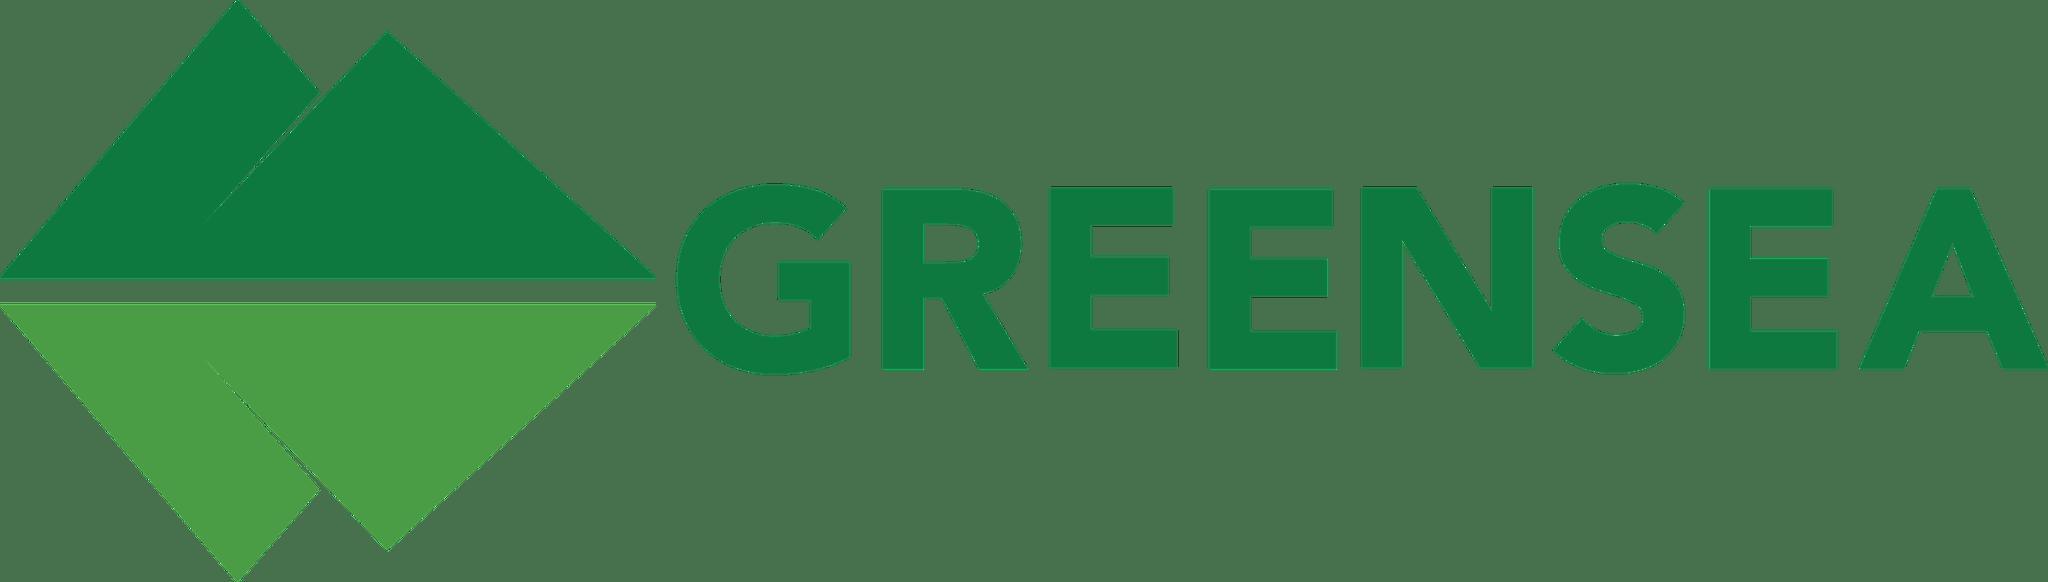 Greensea Systems, Inc.